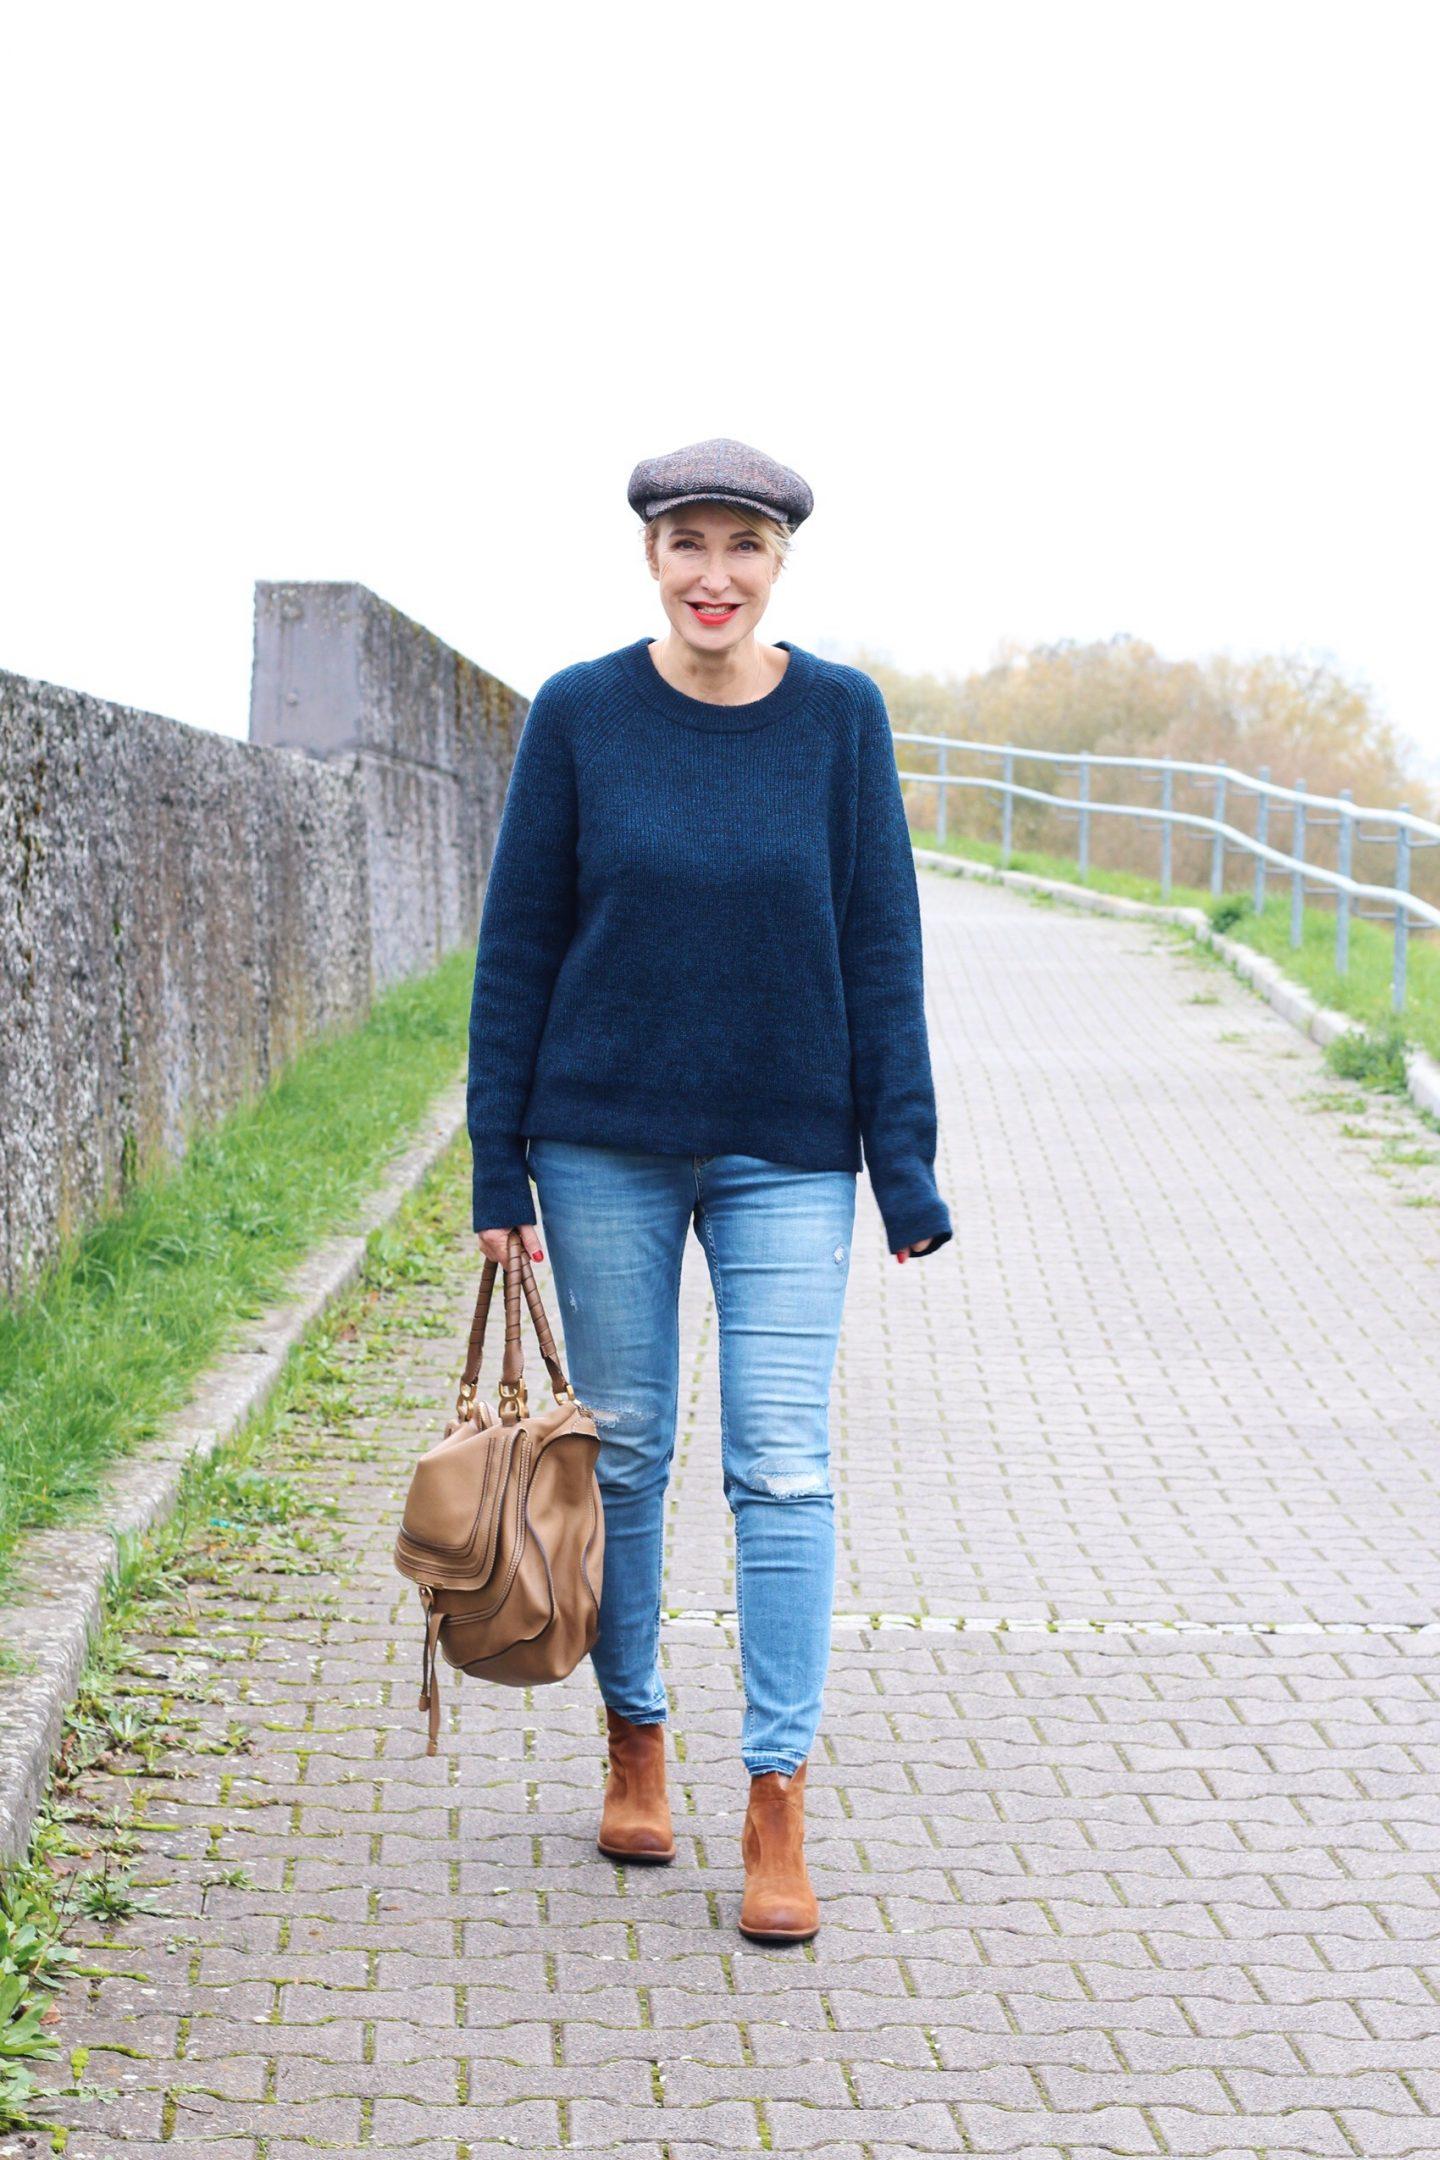 glamupyourlifestyle muetze kappe mode-accessoire ü-40-blog ü-50-blog ue-40-mode